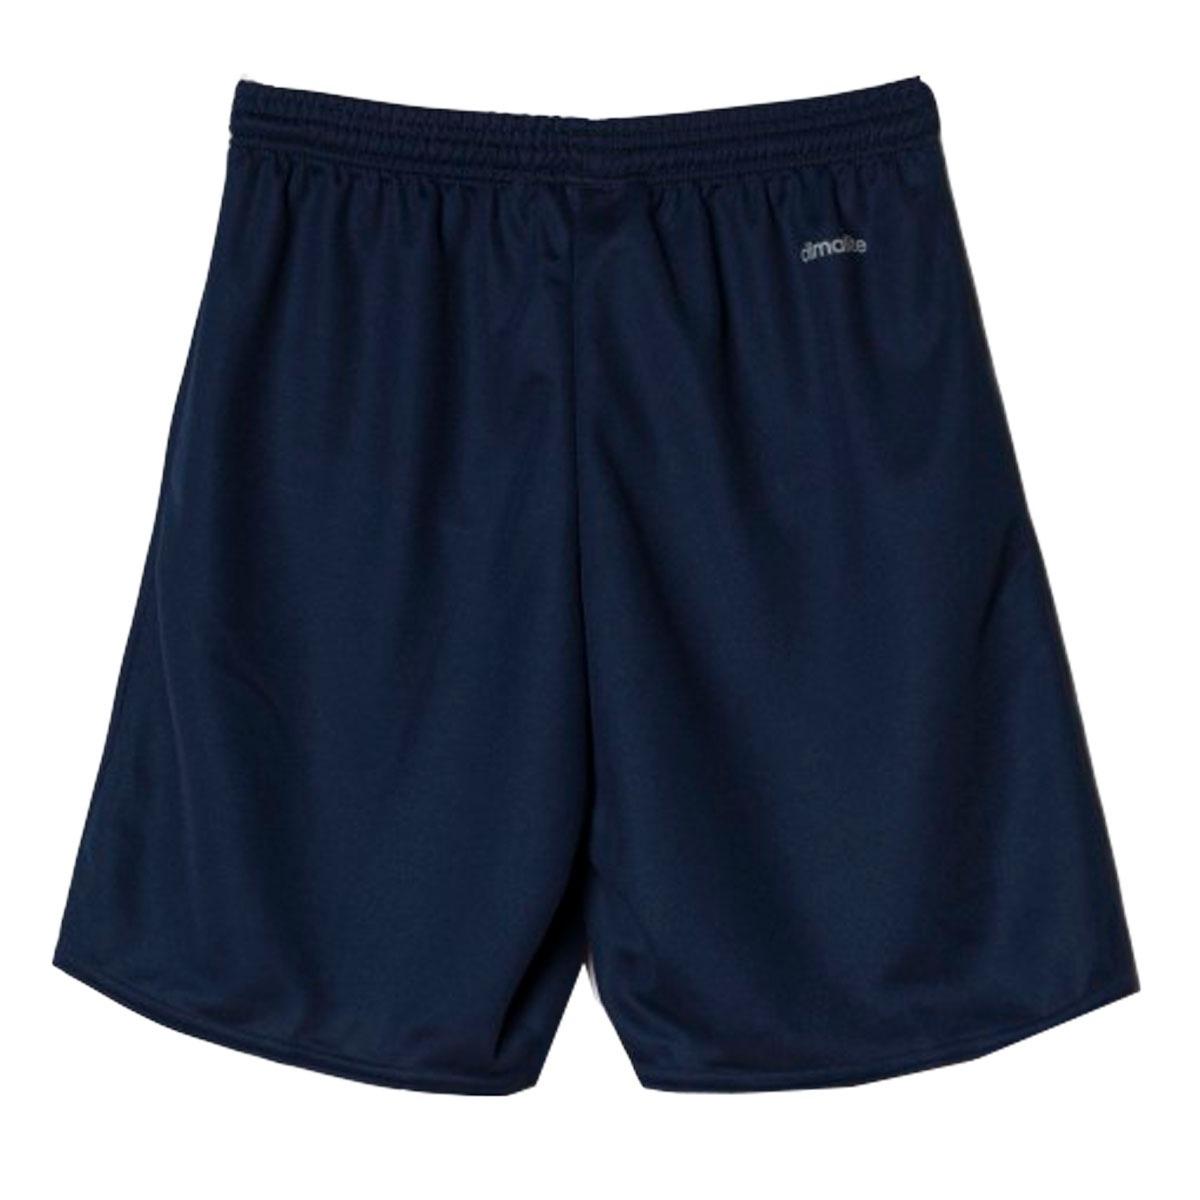 Shorts Infantil Menino adidas Parma 16 Futebol Bh6937 - R  62 5e8862add984a